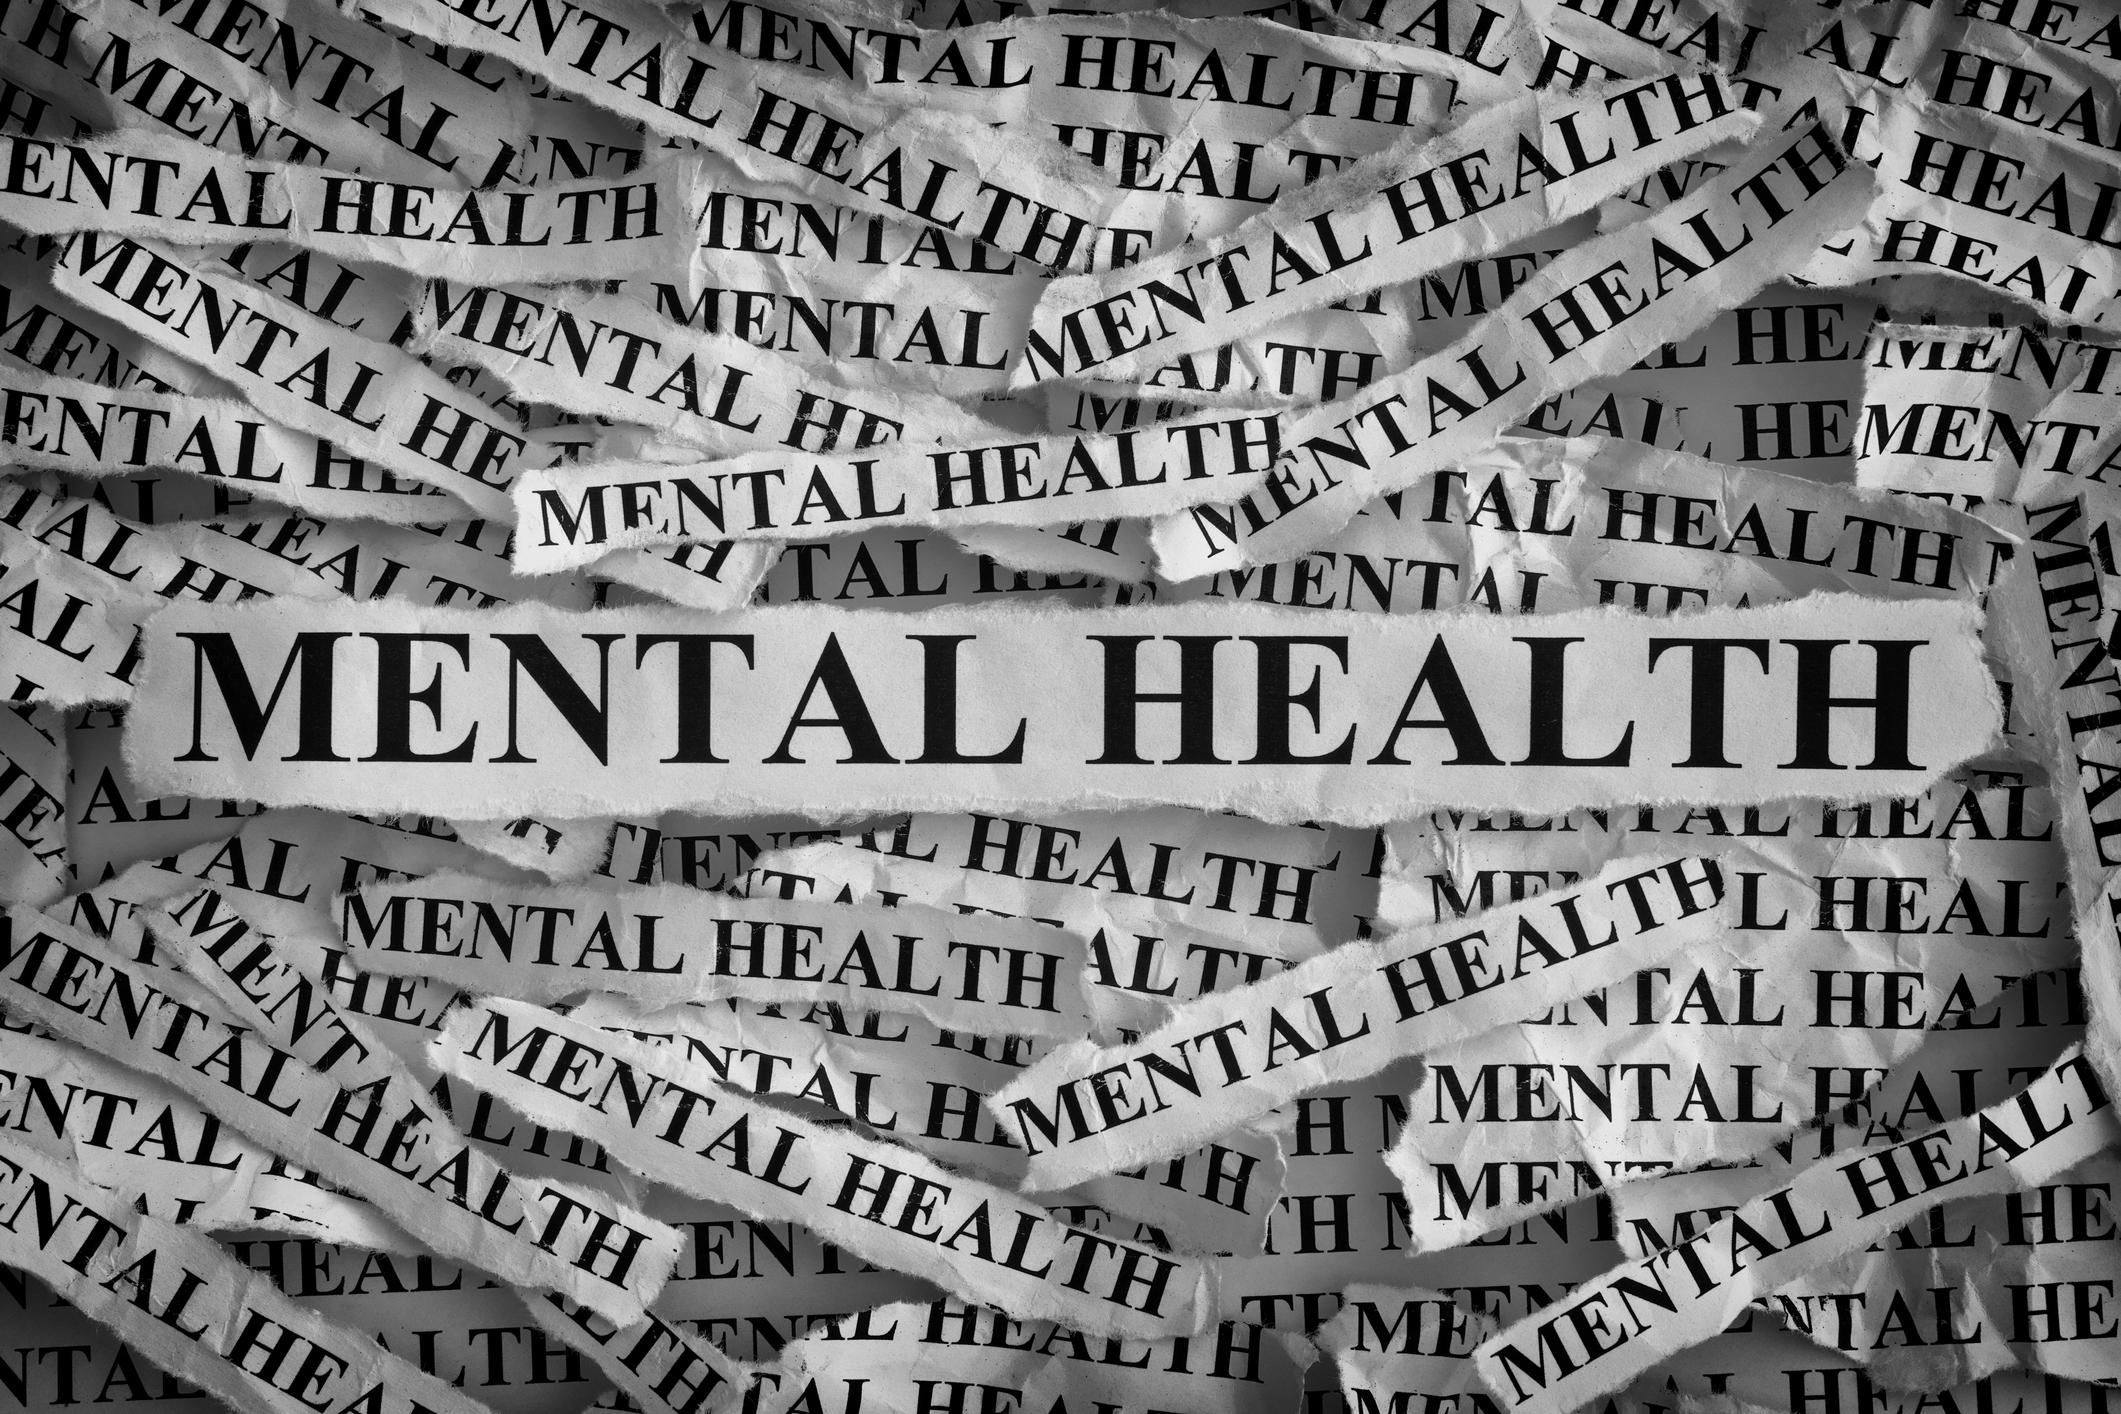 The Impact Of Mental Illness Stigma On Seeking And